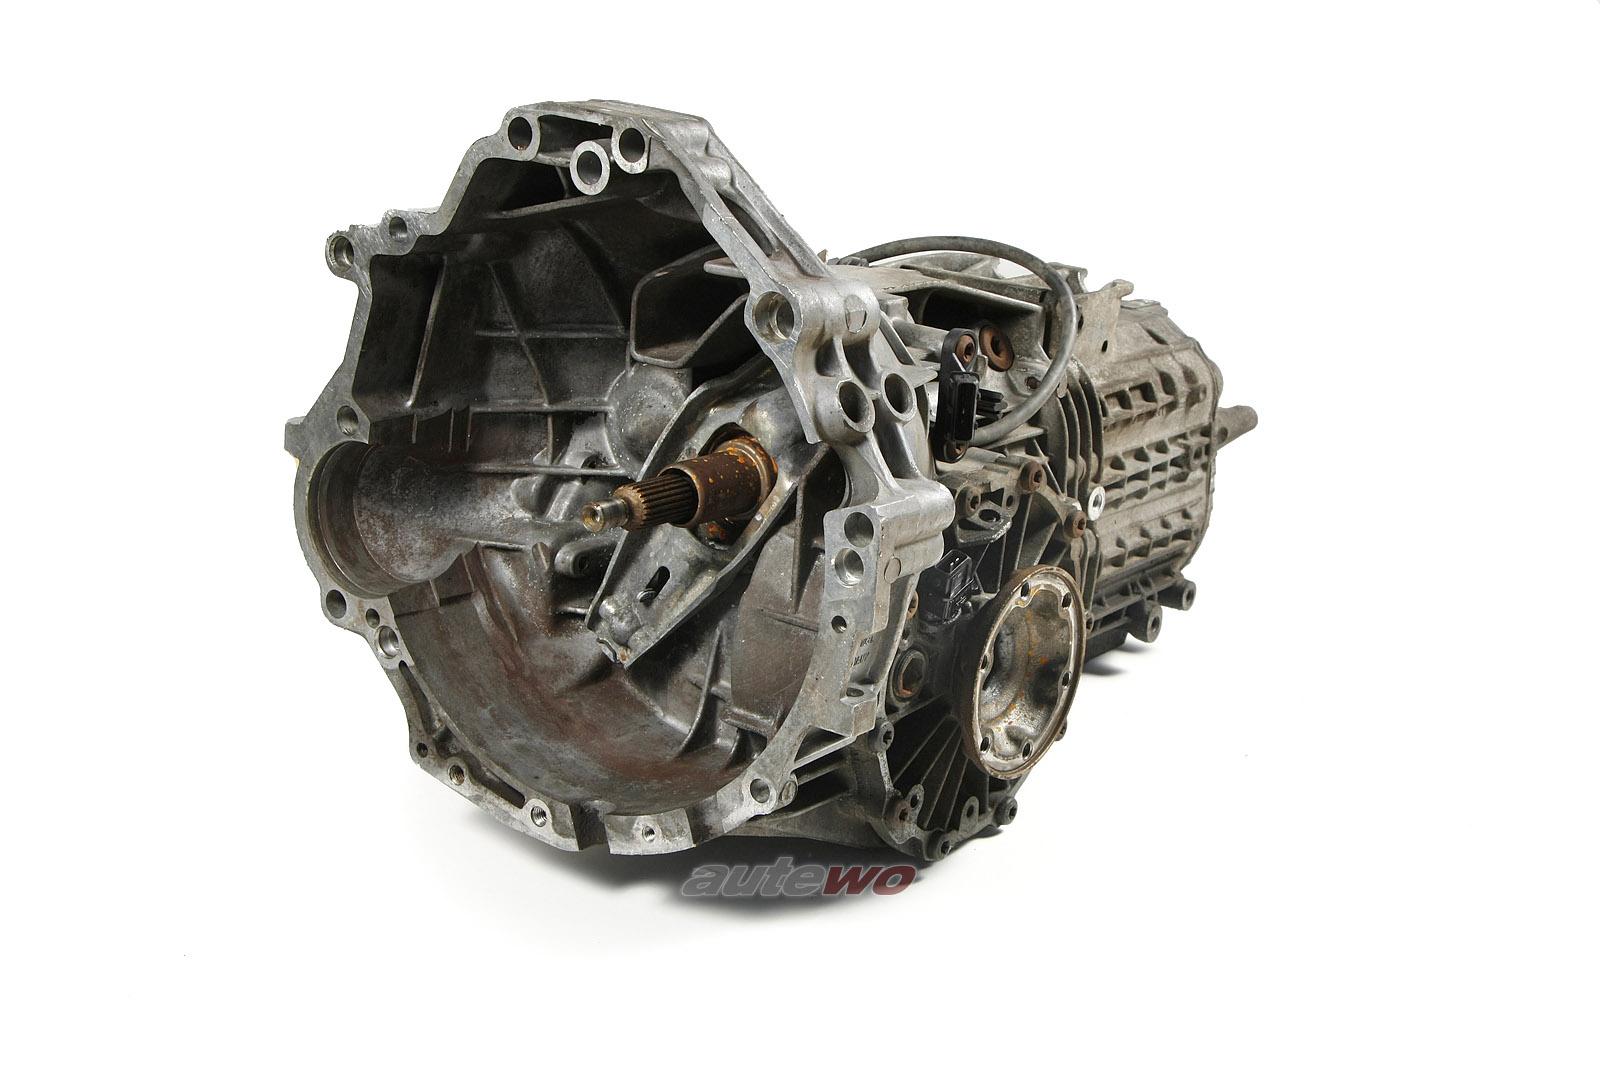 012300048CX Audi 80 B4/Coupe/Cabrio Typ 89/A6 C4 2.0l Schaltgetriebe CPA 20075